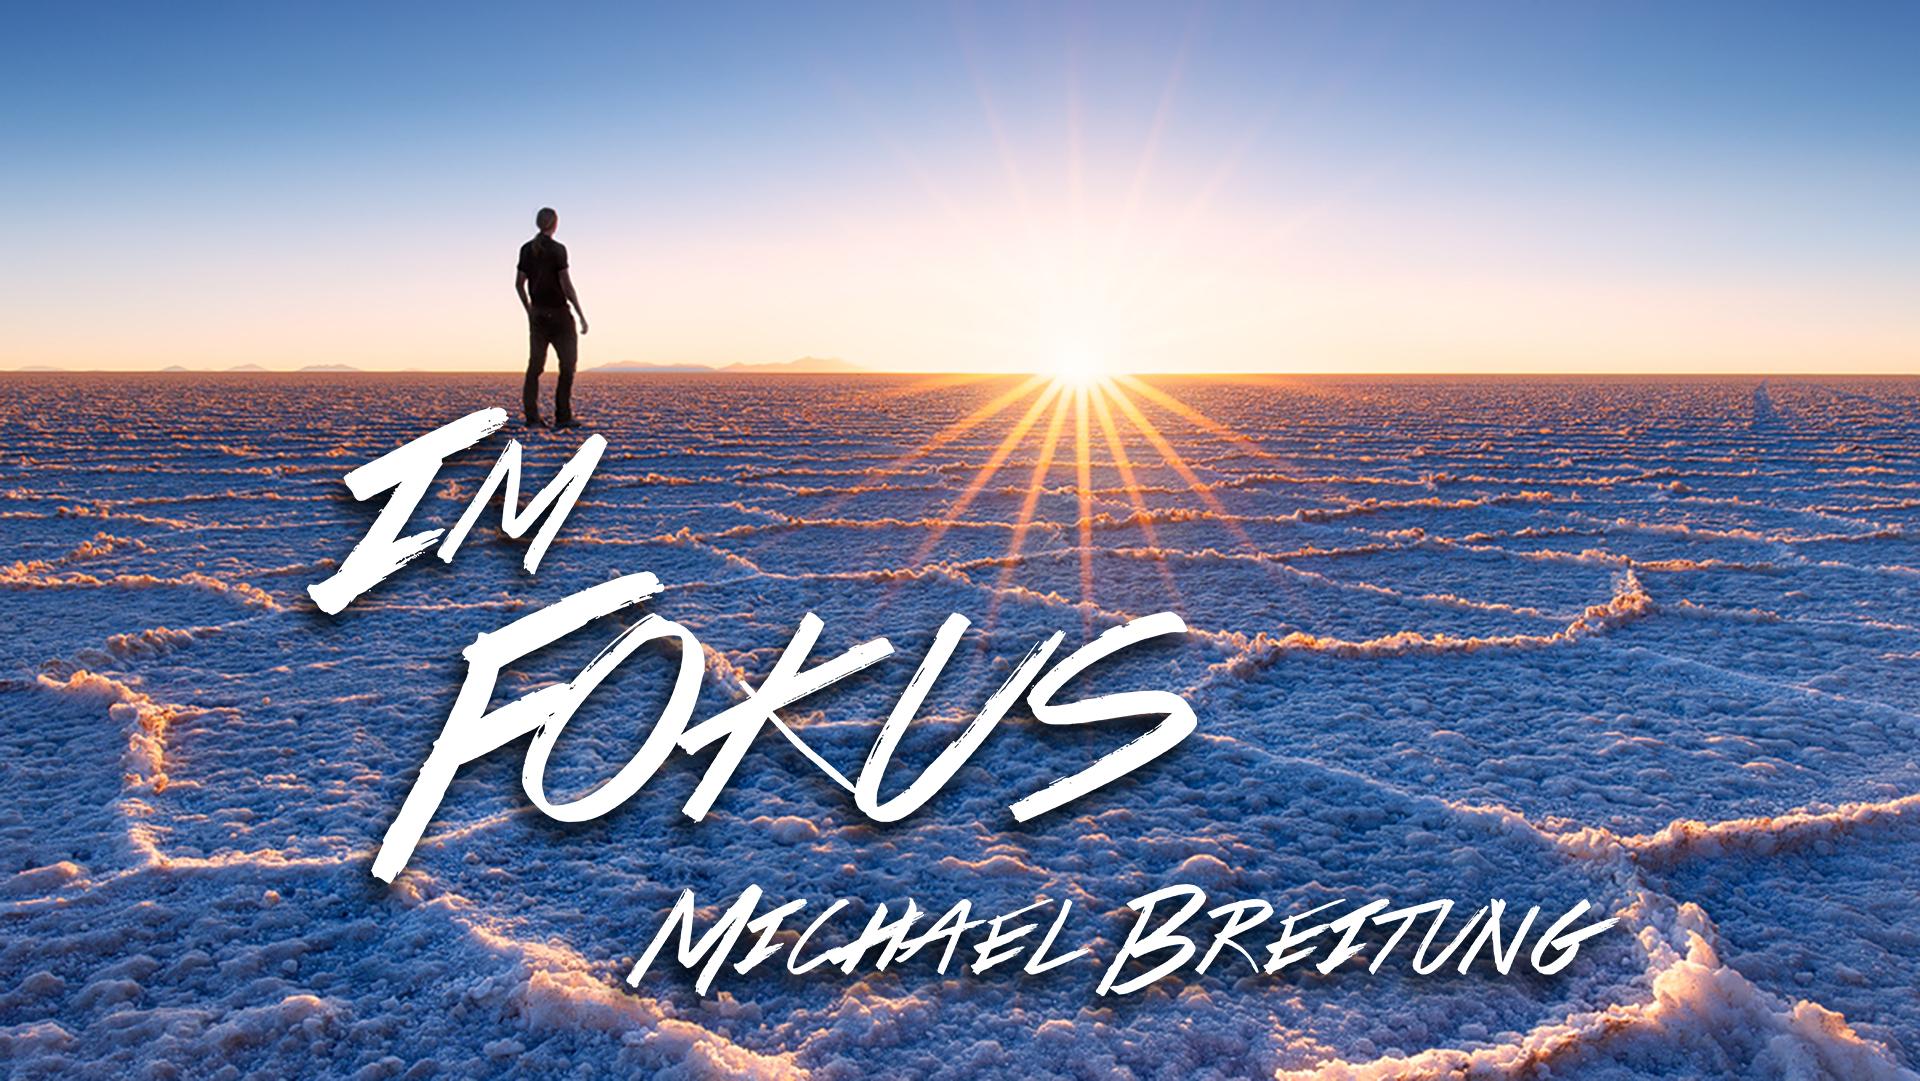 Michael Breitung im Fokus